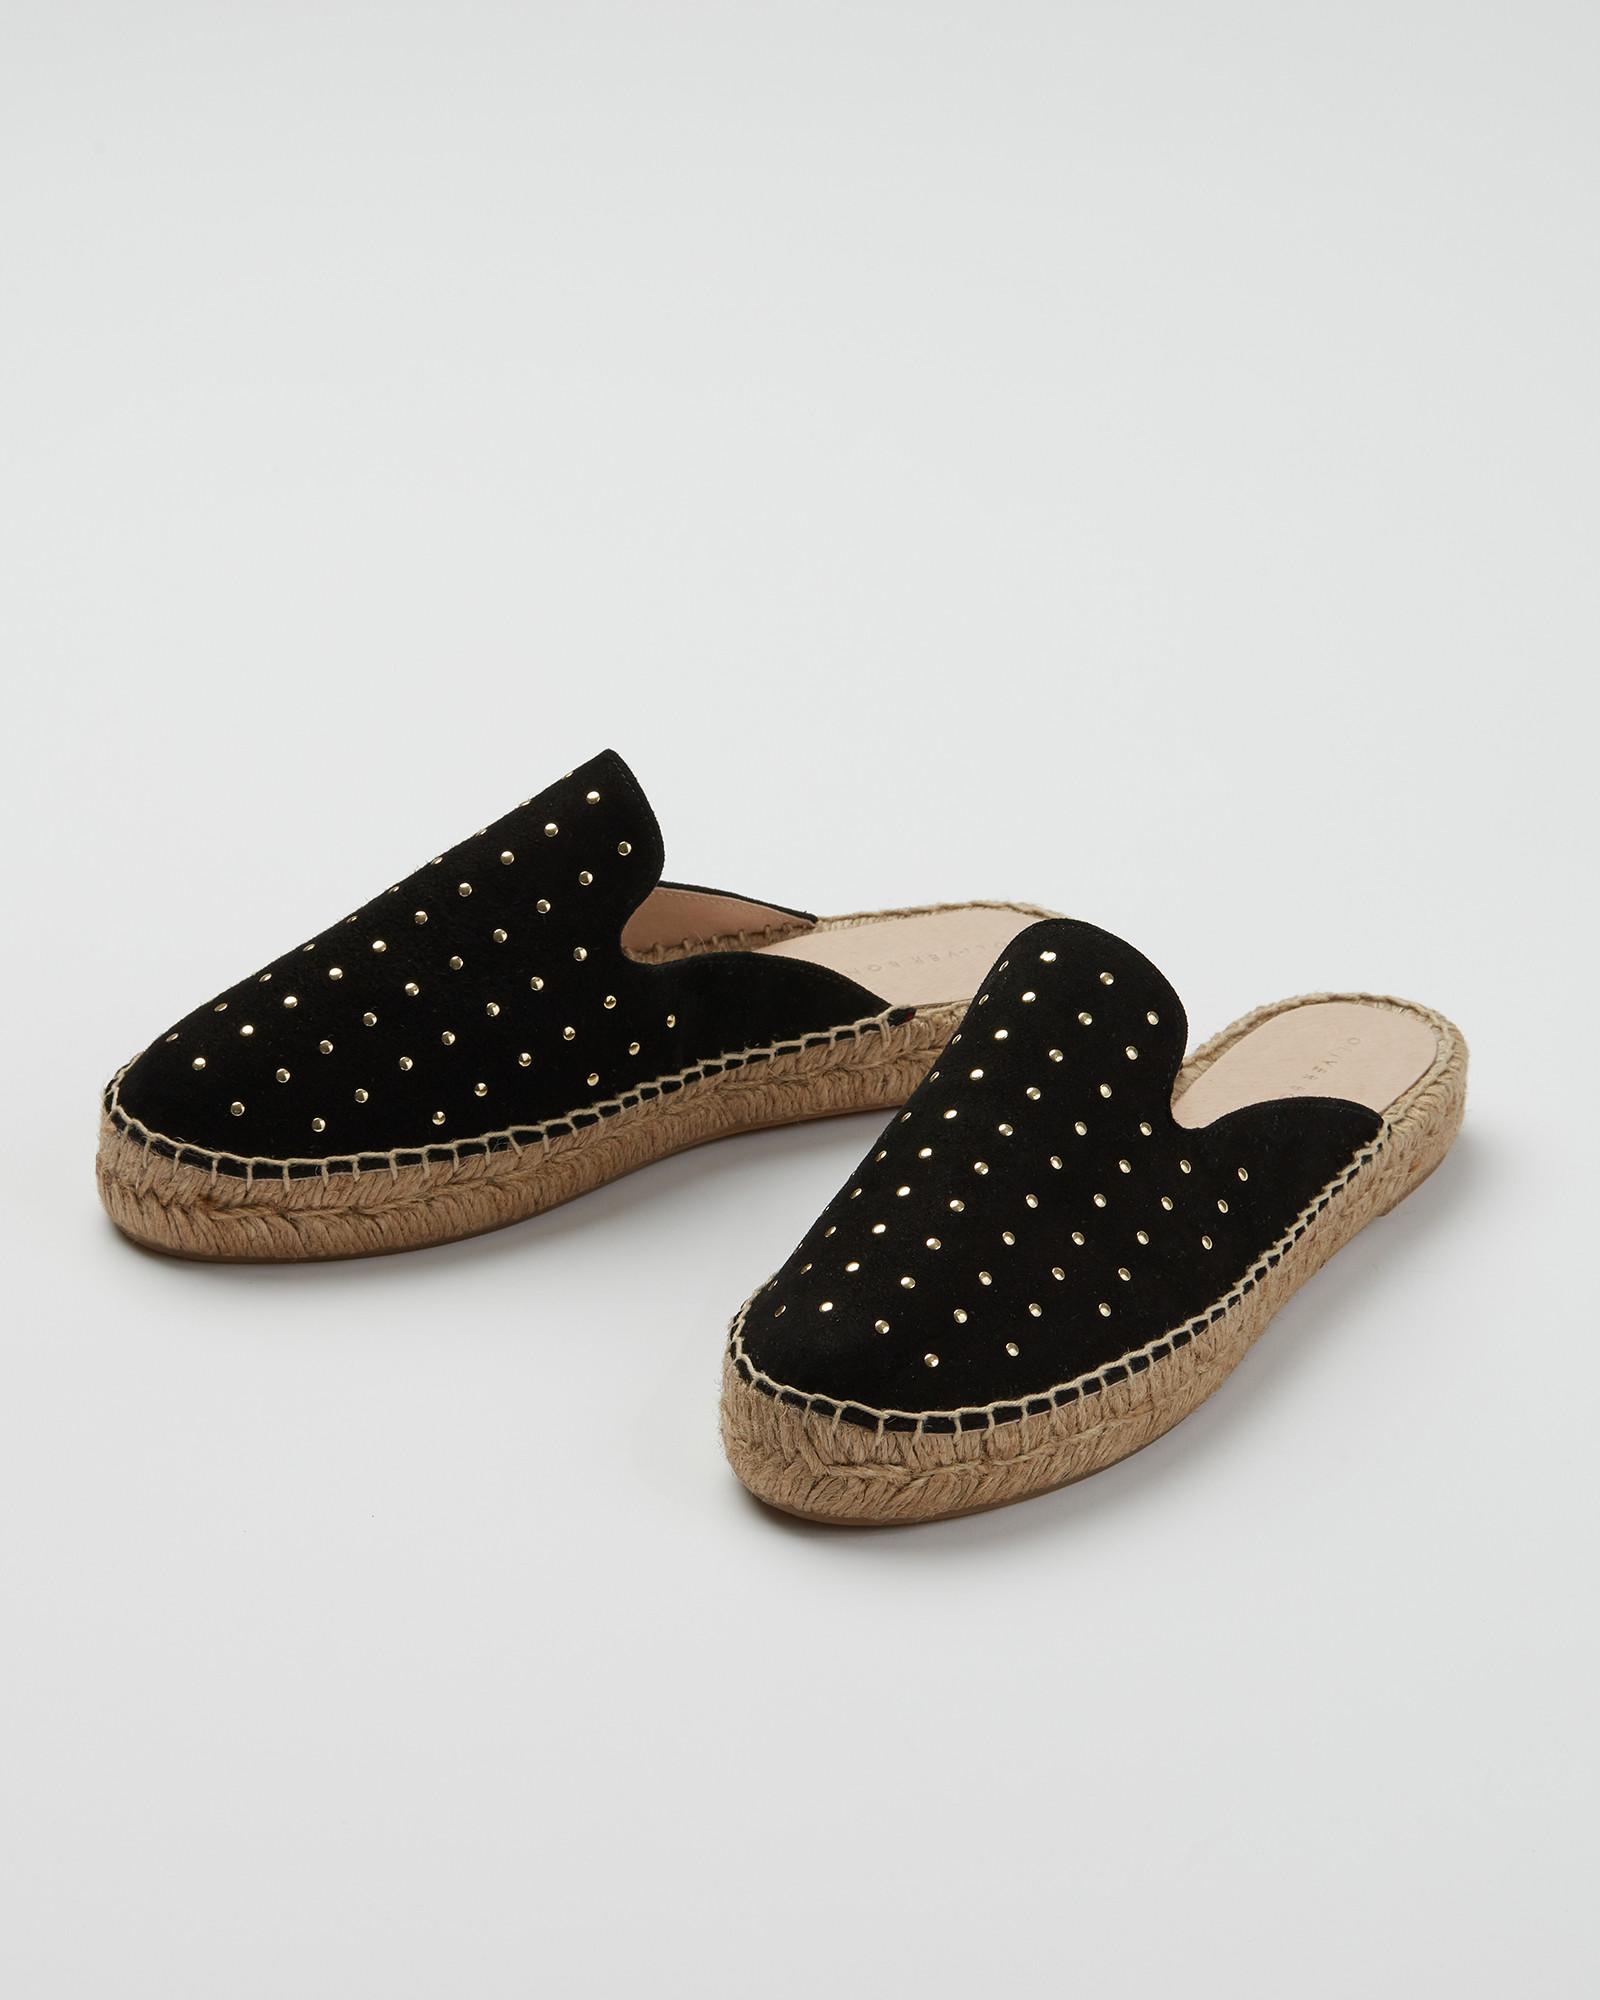 Black Espadrille Sandals | Oliver Bonas